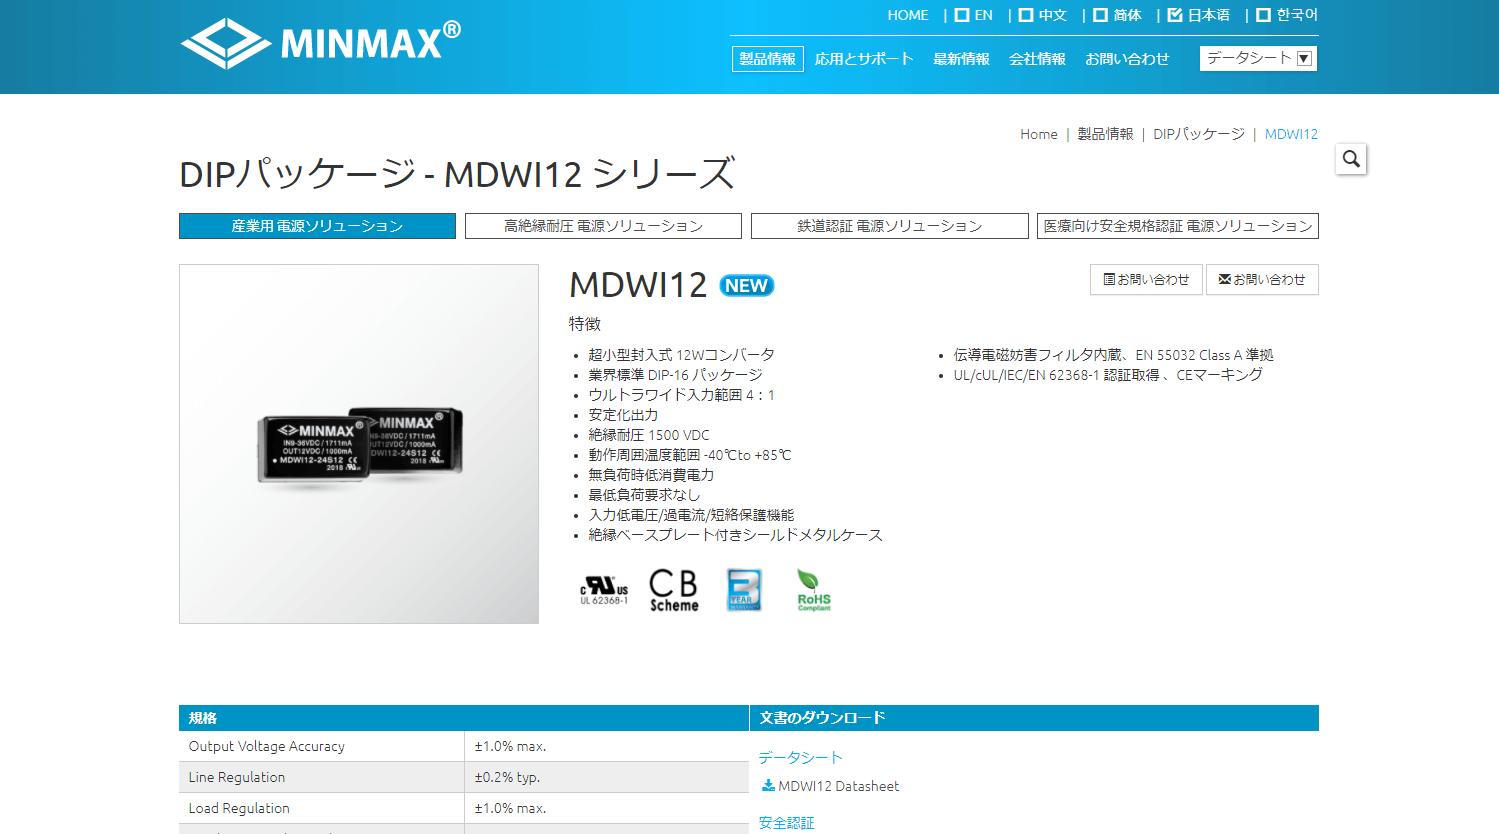 DIPパッケージ - MDWI12 シリーズ